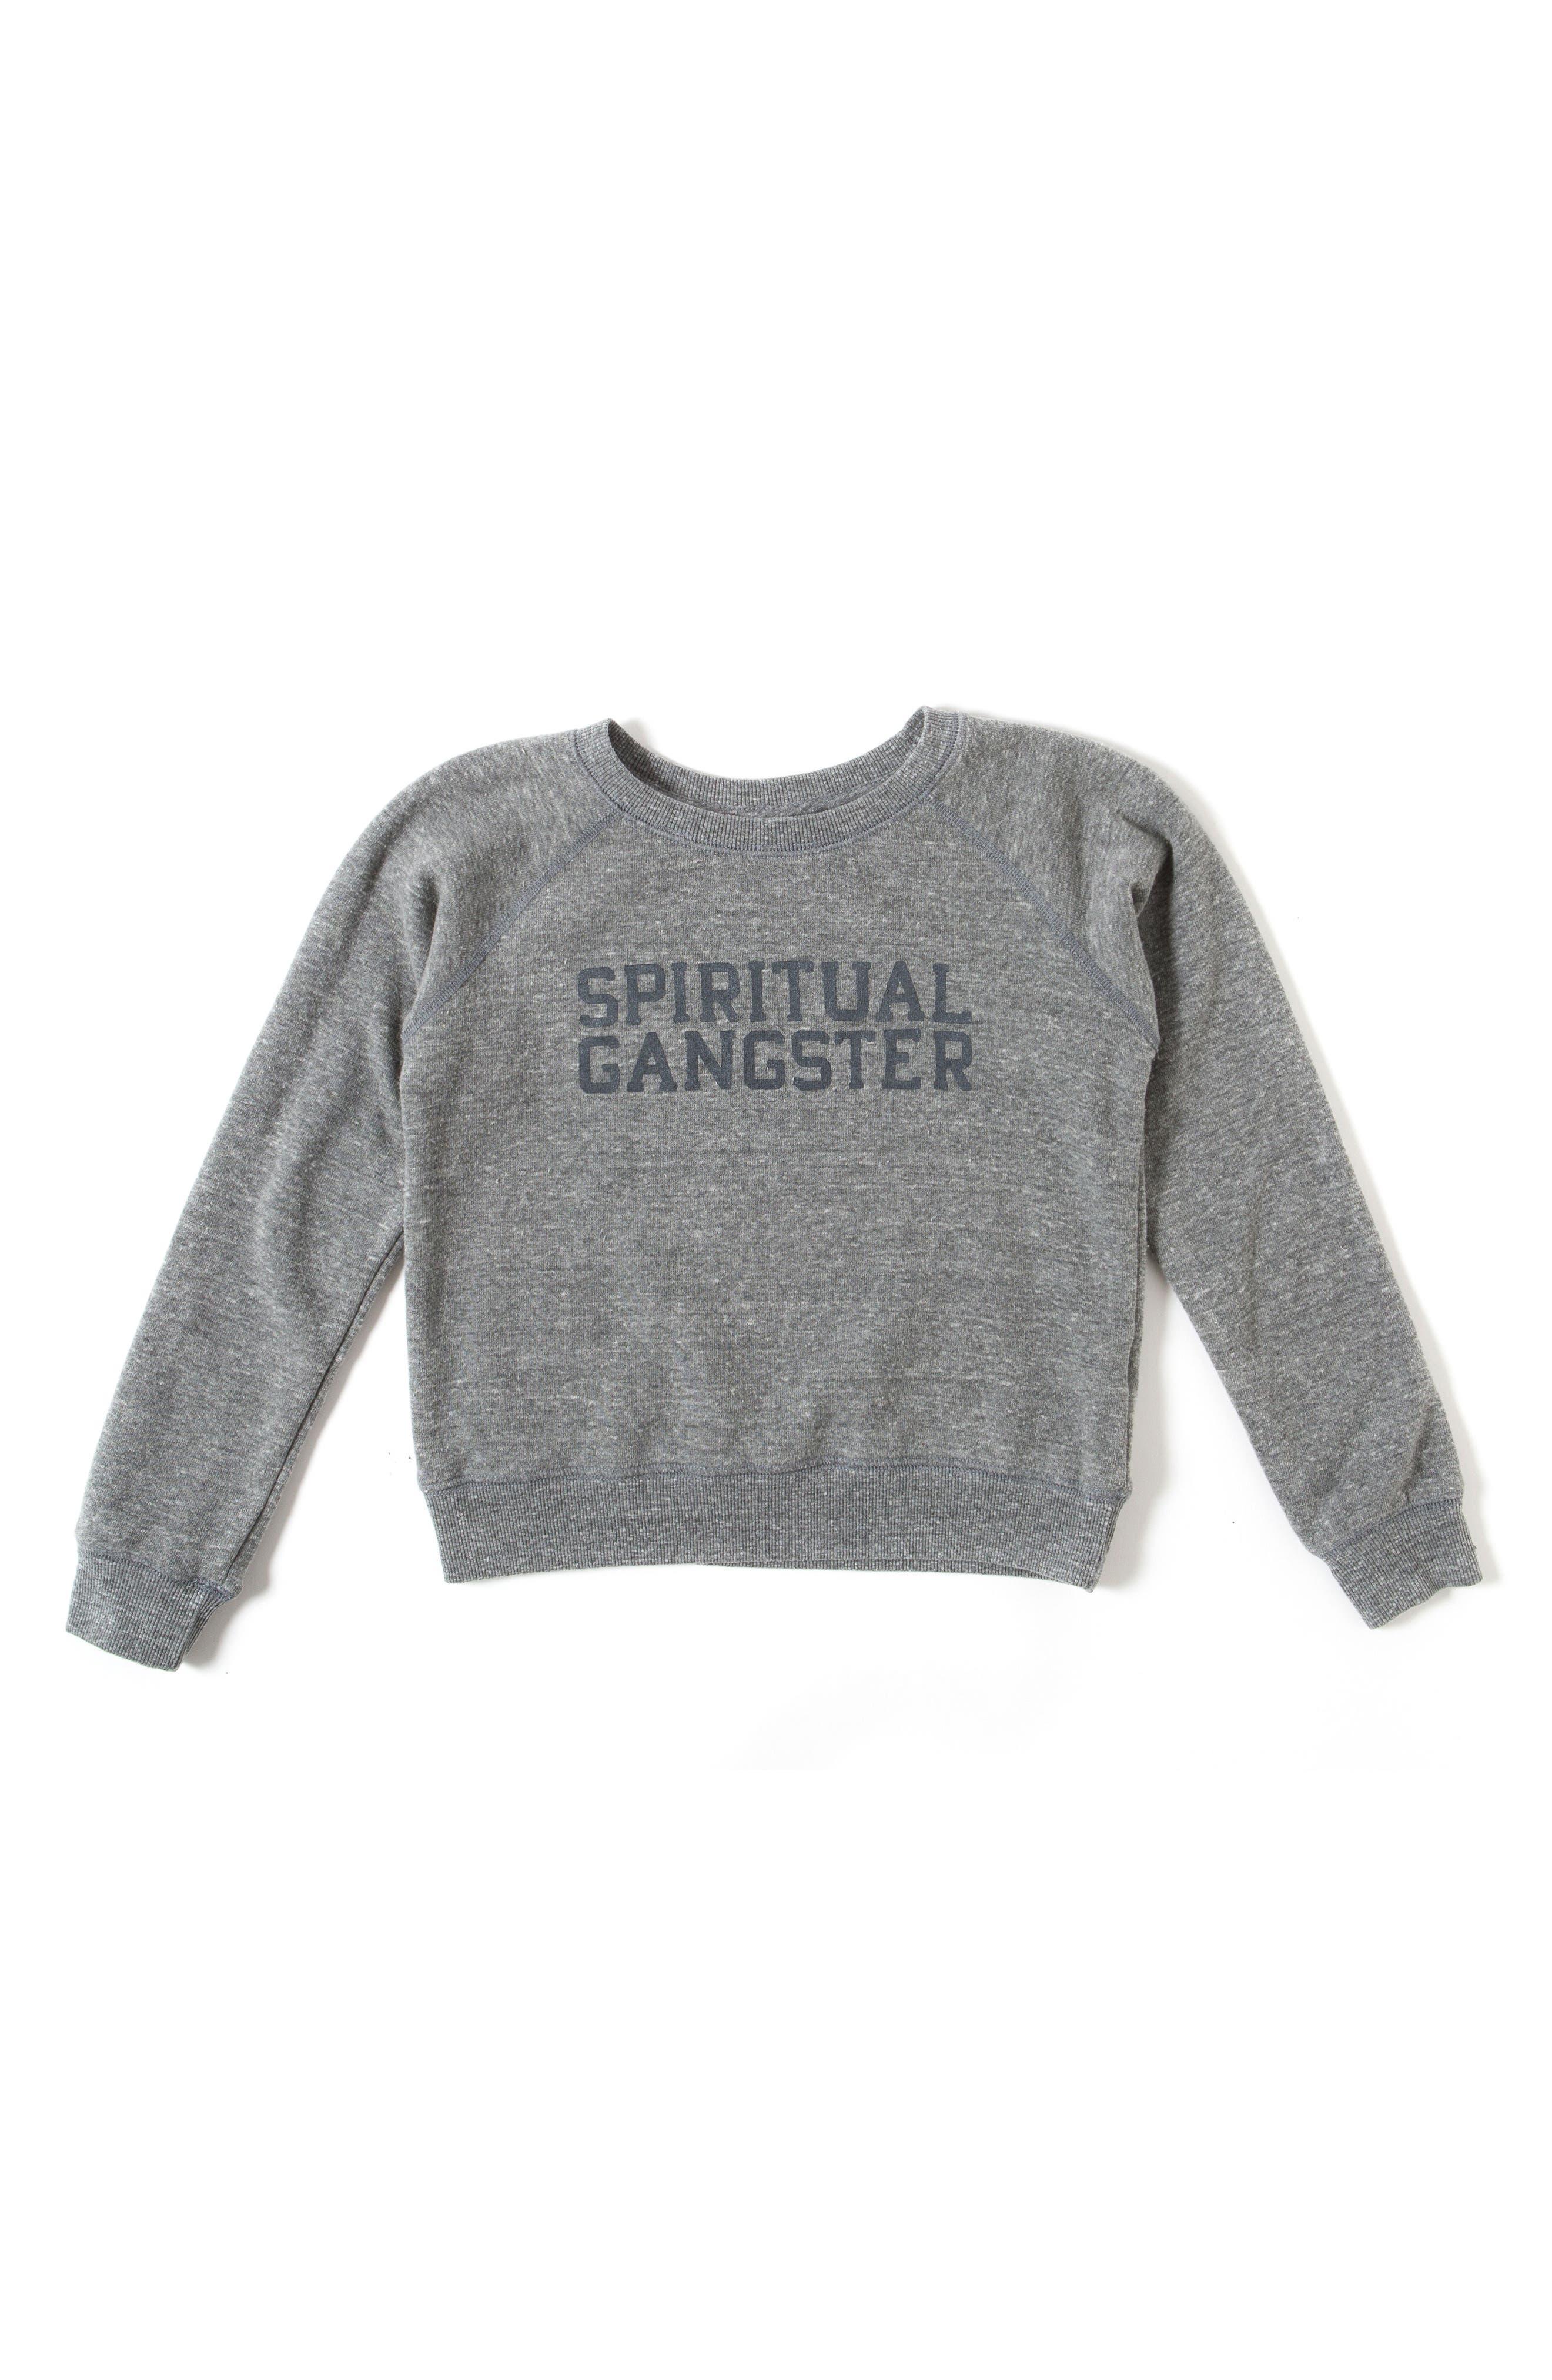 Alternate Image 1 Selected - Spiritual Gangster Varsity Logo Sweatshirt (Big Boys)